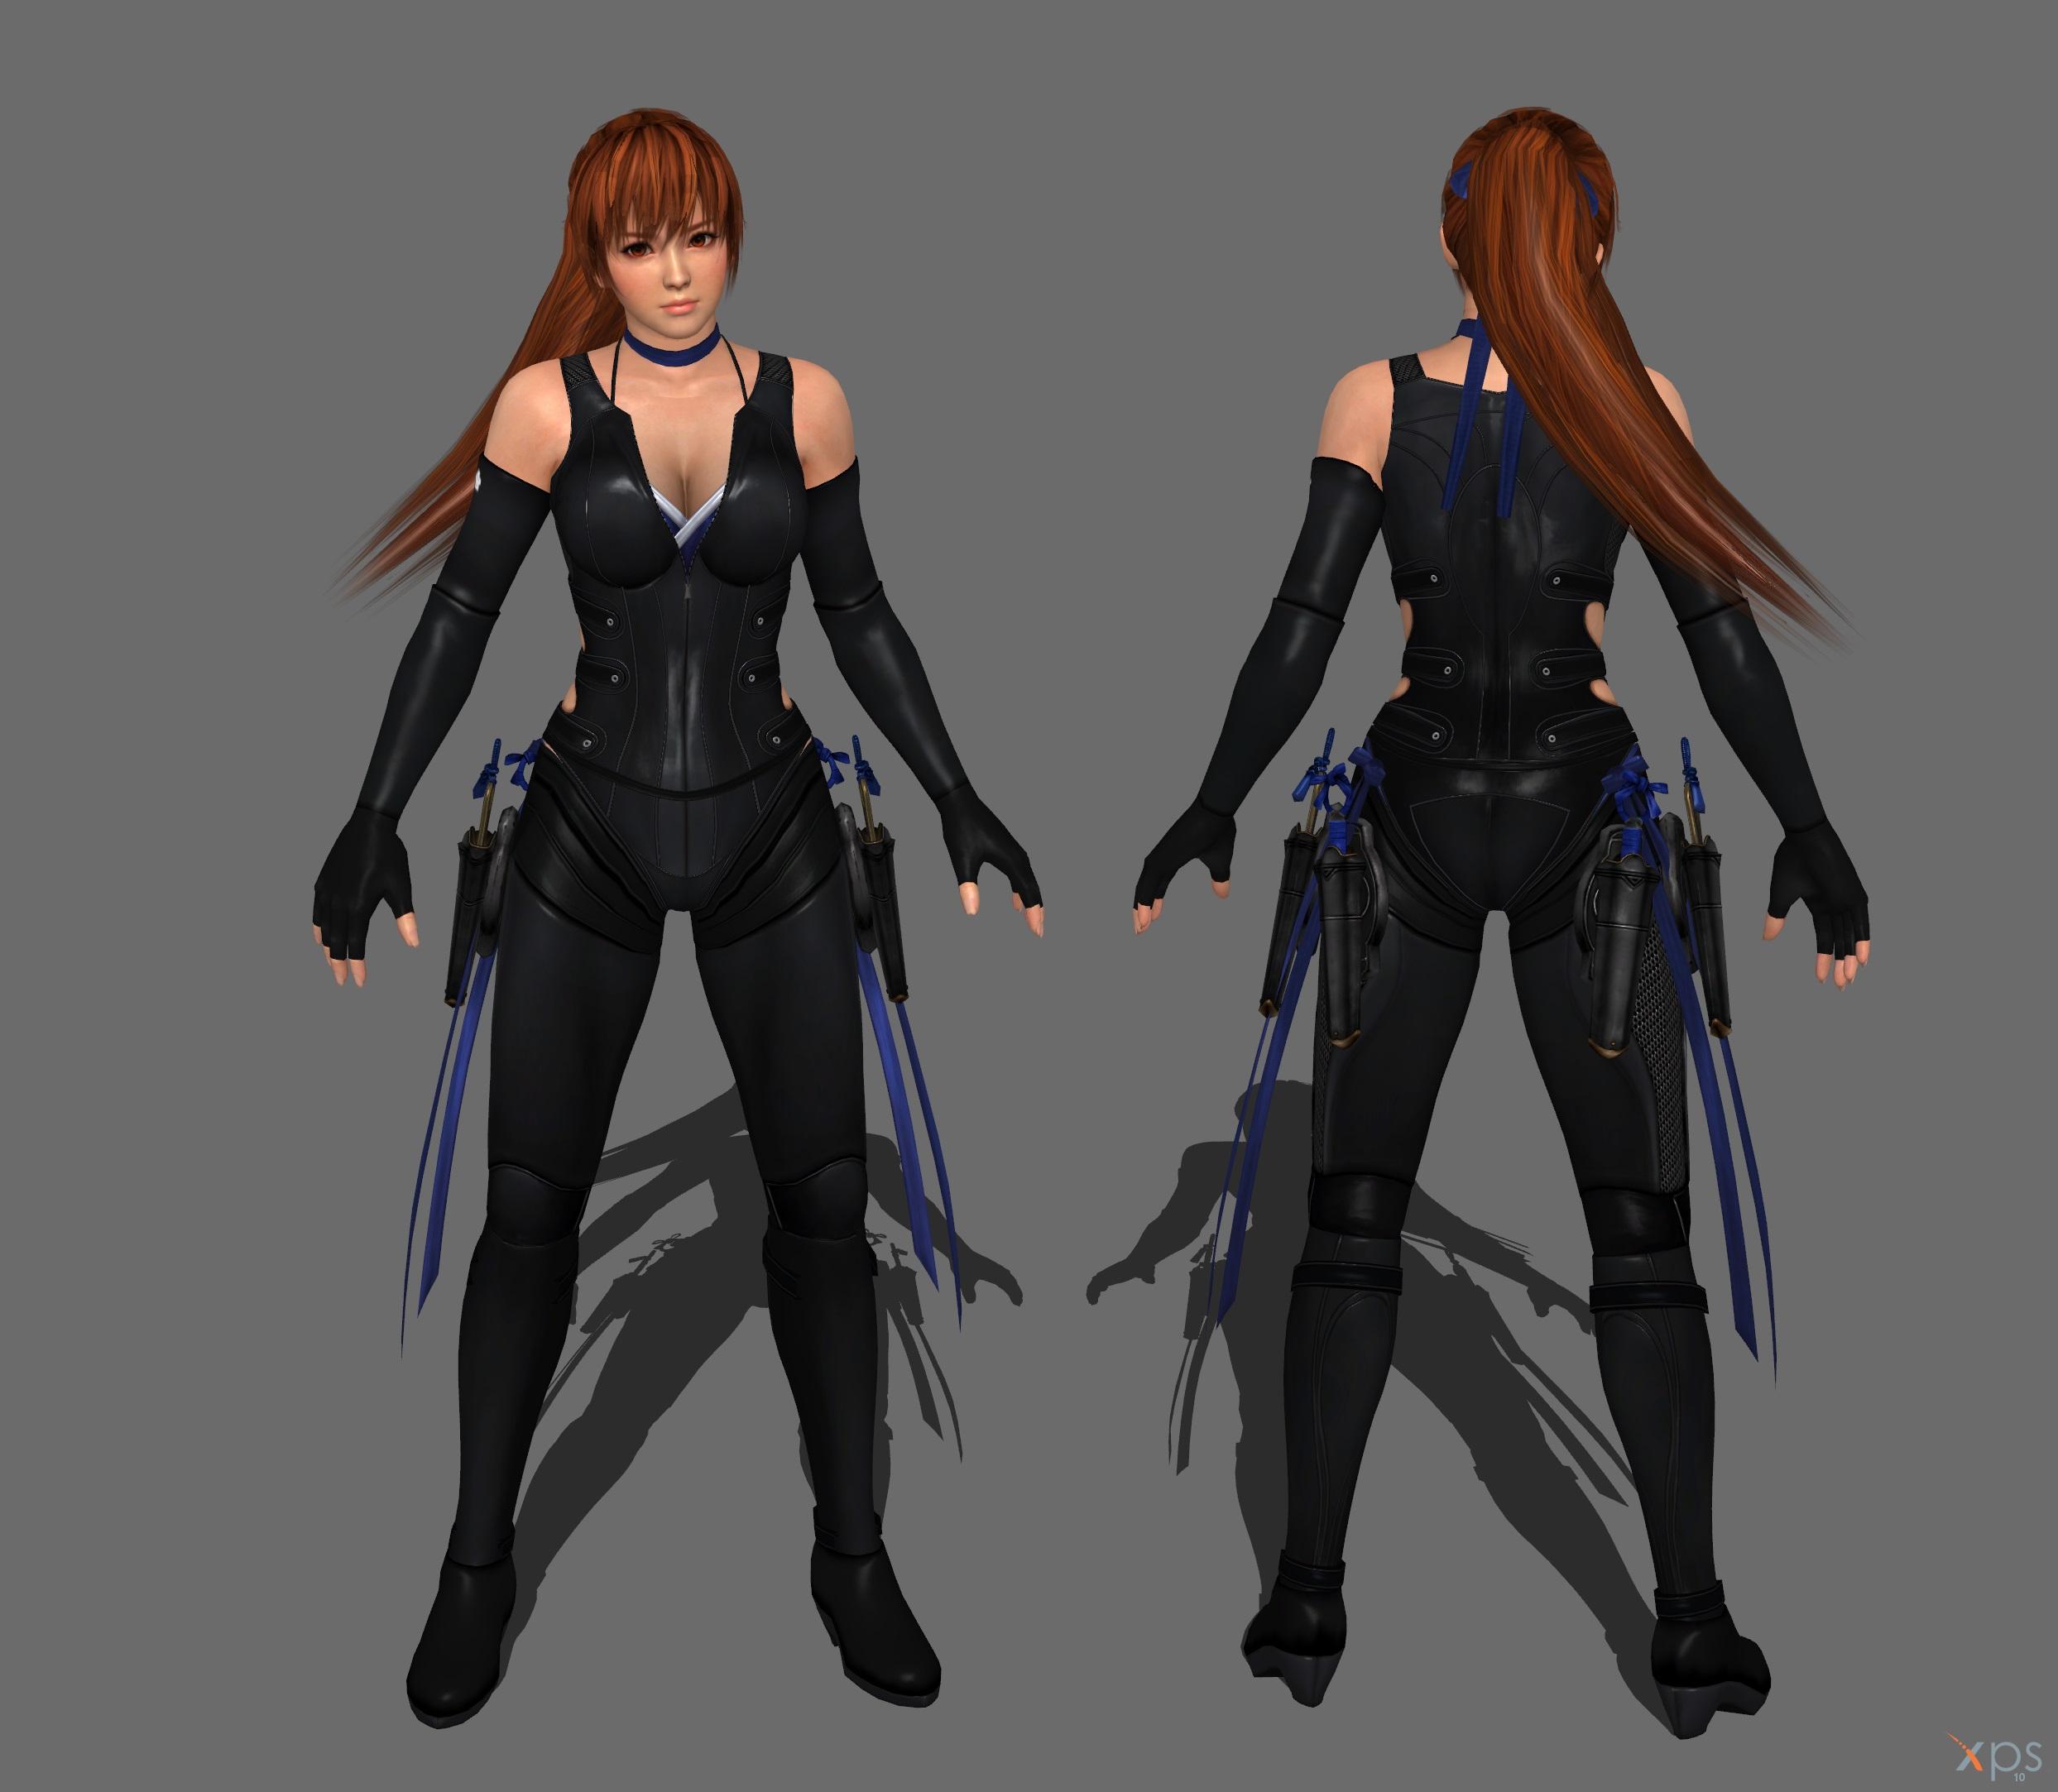 DOA 5 - Kasumi Ninja Outfit [No Gear] by IshikaHiruma